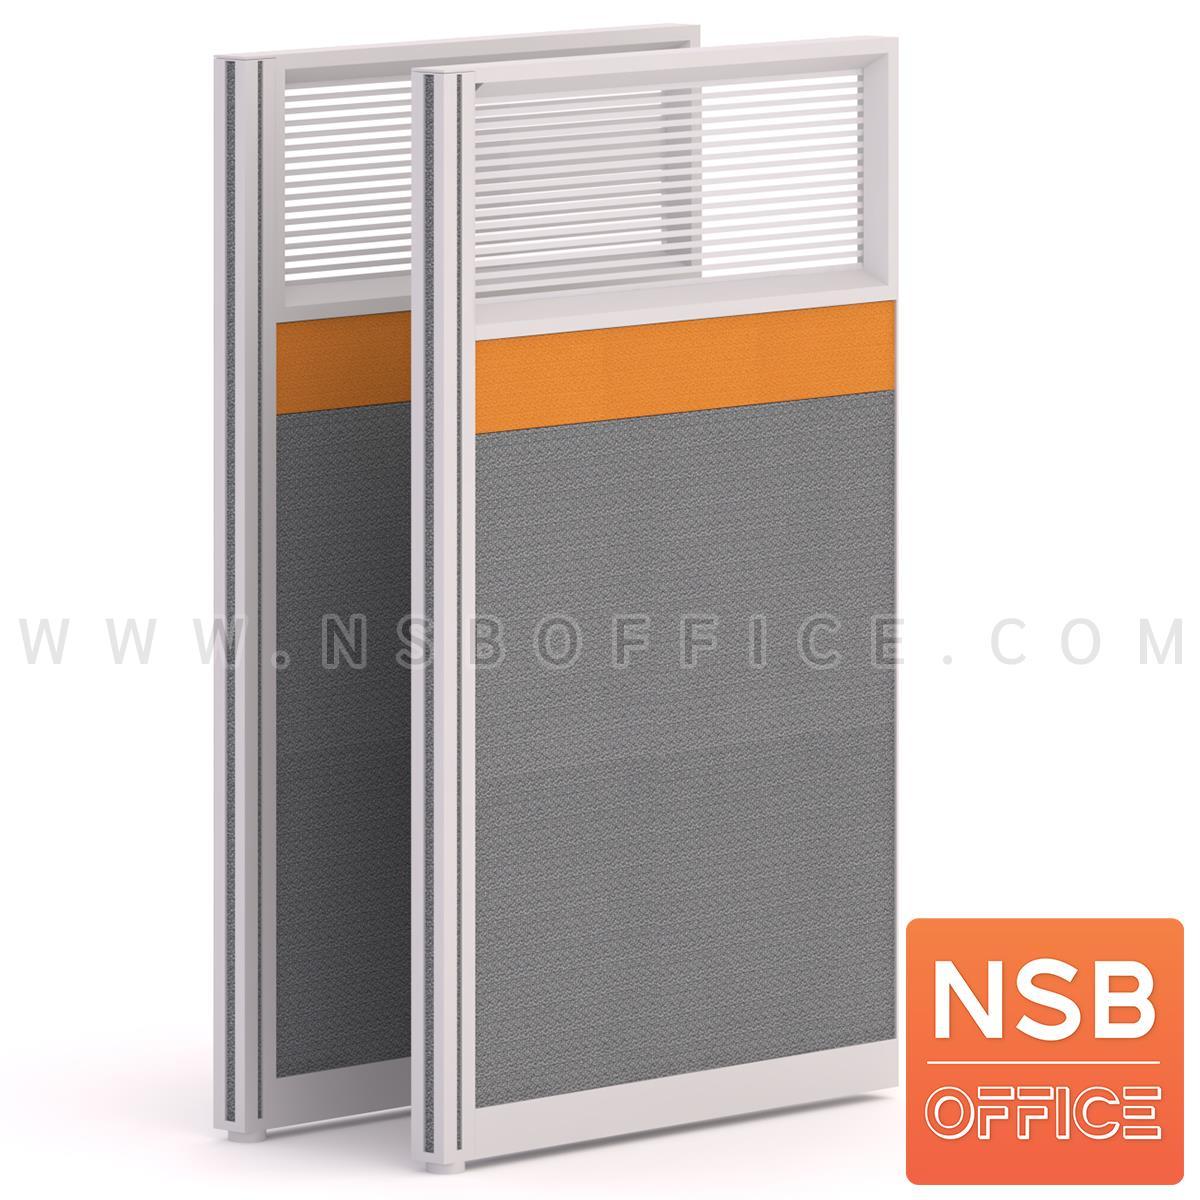 P01A063:พาร์ทิชั่น NSB ครึ่งทึบครึ่งกระจกขัดลาย สี Two Tone พร้อมเสาเริ่ม  สูง 120 cm.